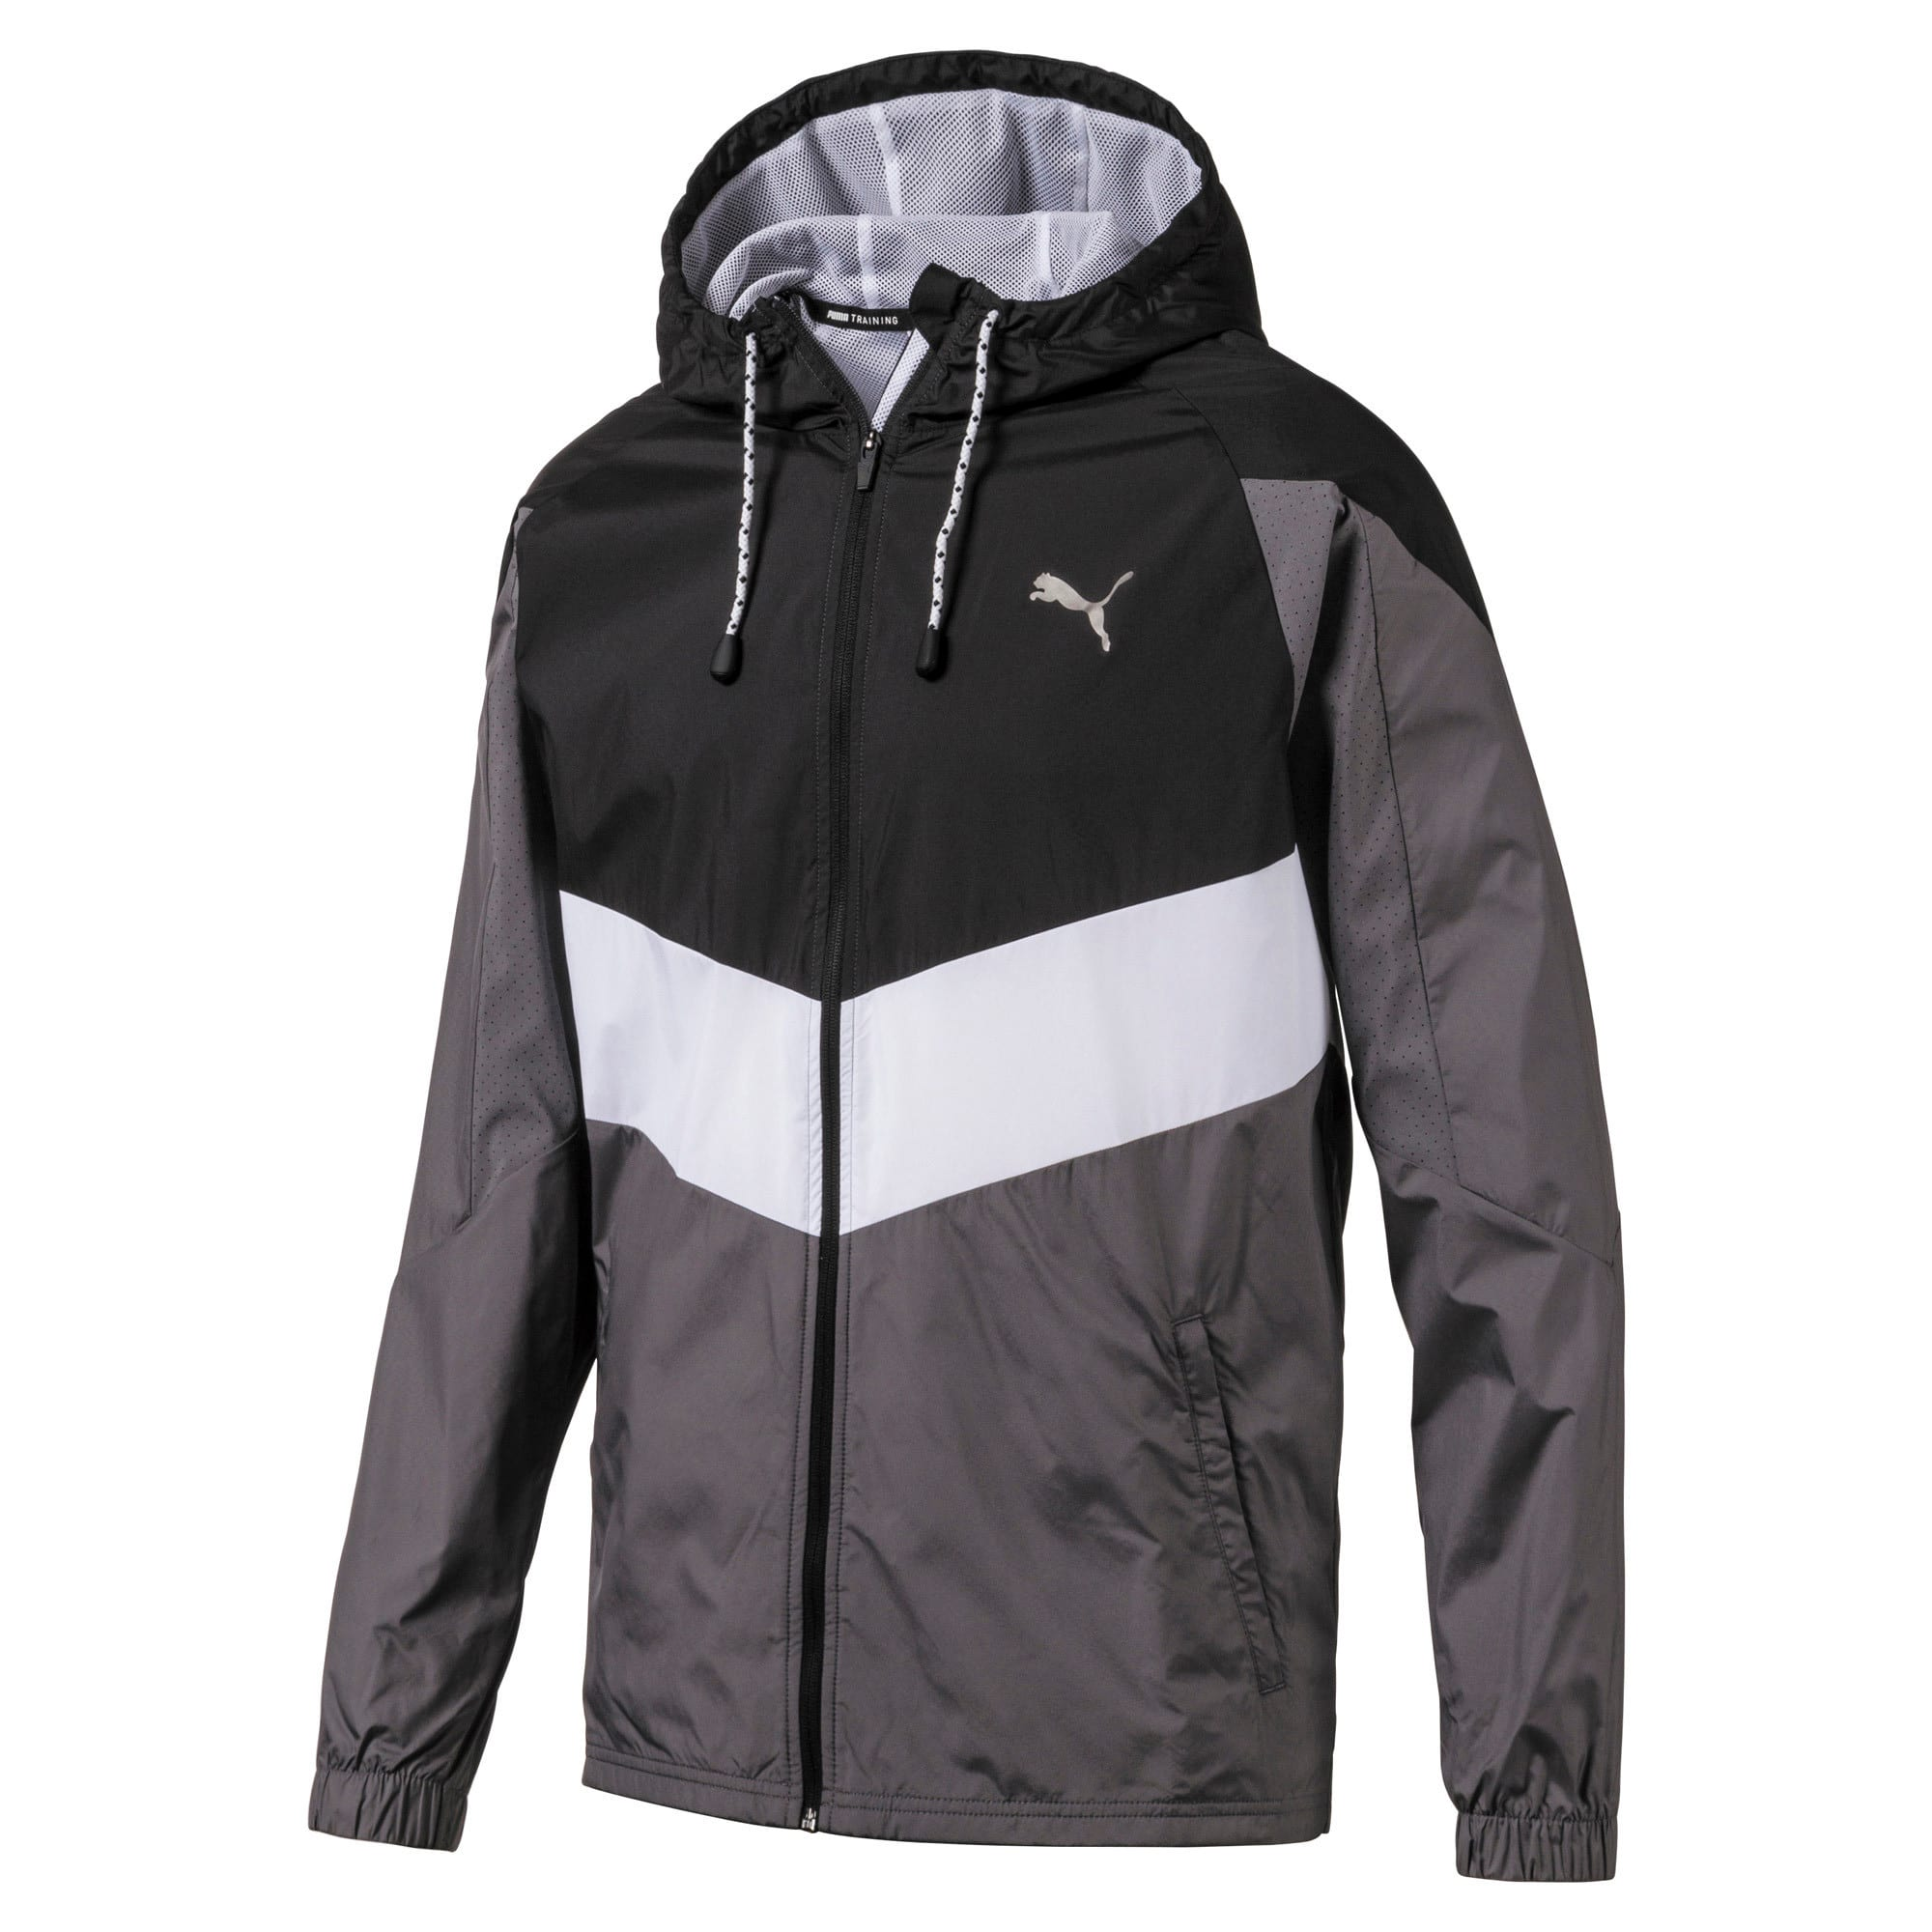 Thumbnail 4 of Reactive Woven Men's Training Jacket, Black-CASTLEROCK-White, medium